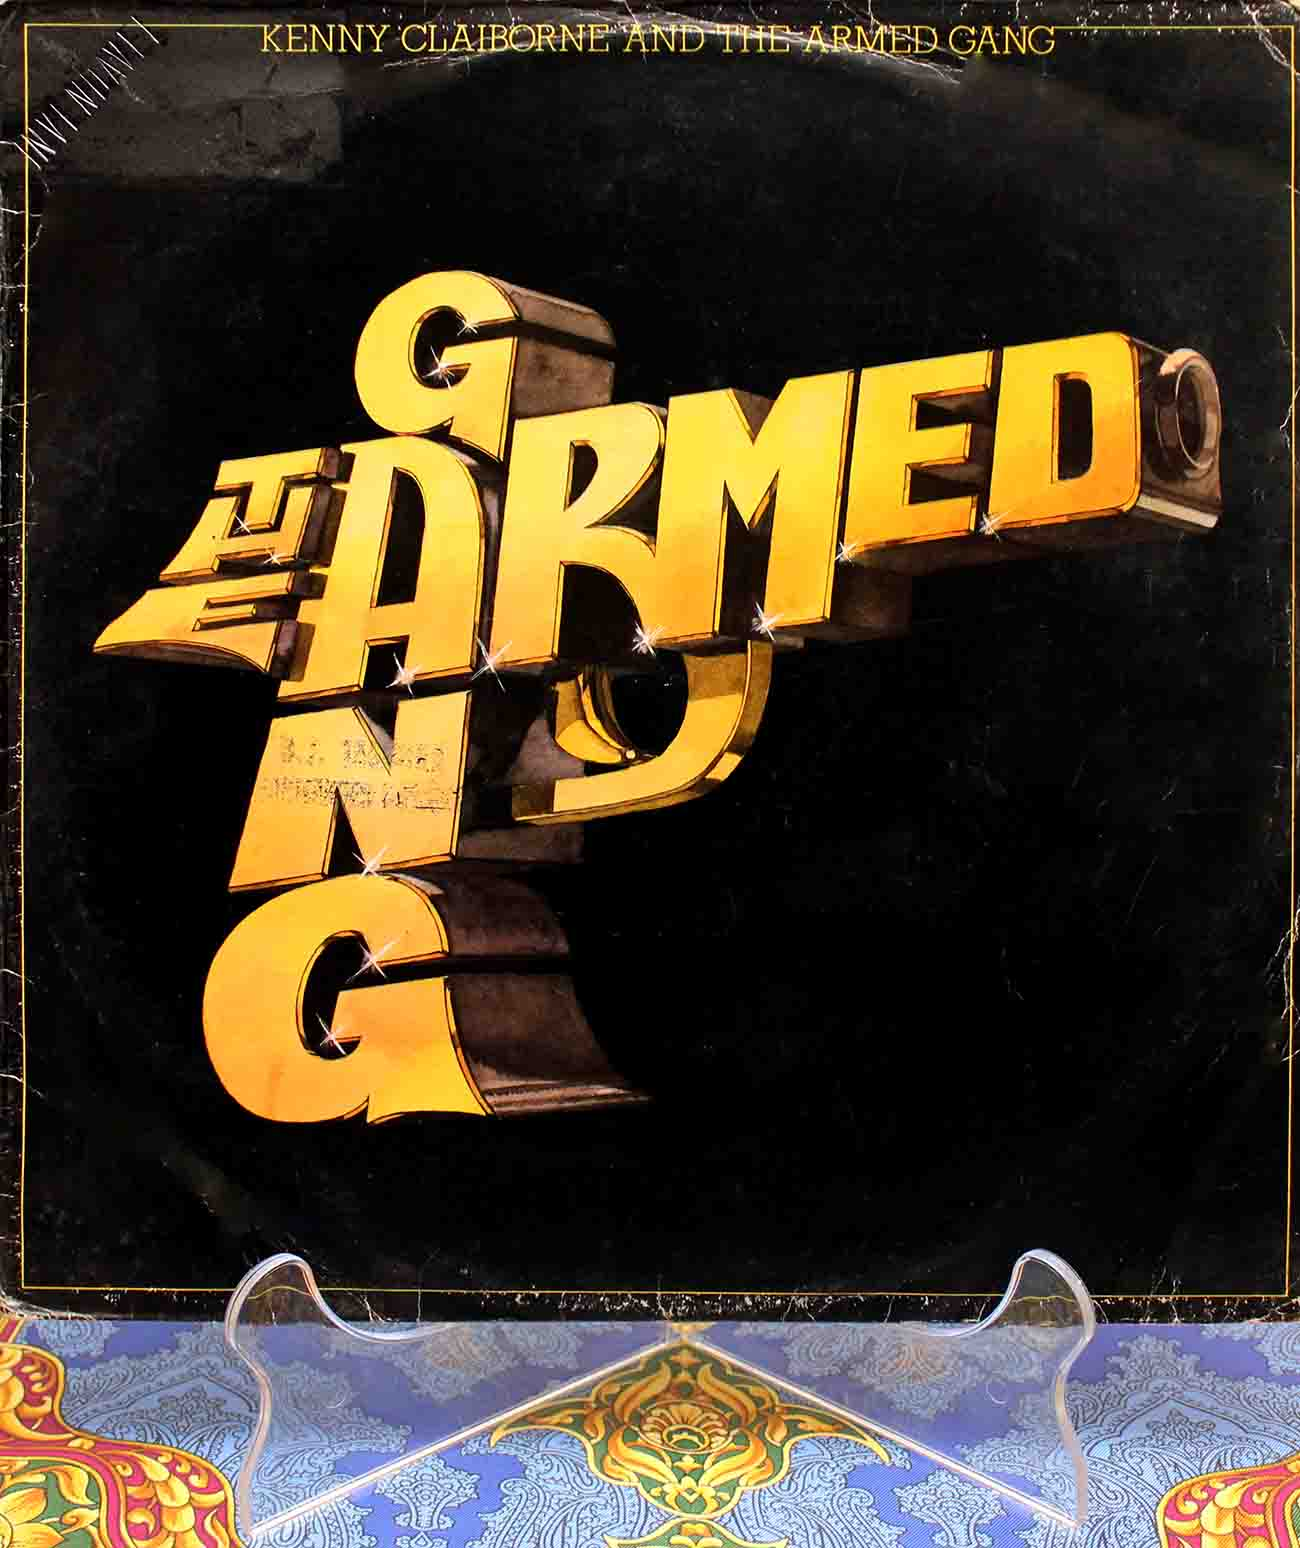 Armed Gang – The Armed Gang LP 01